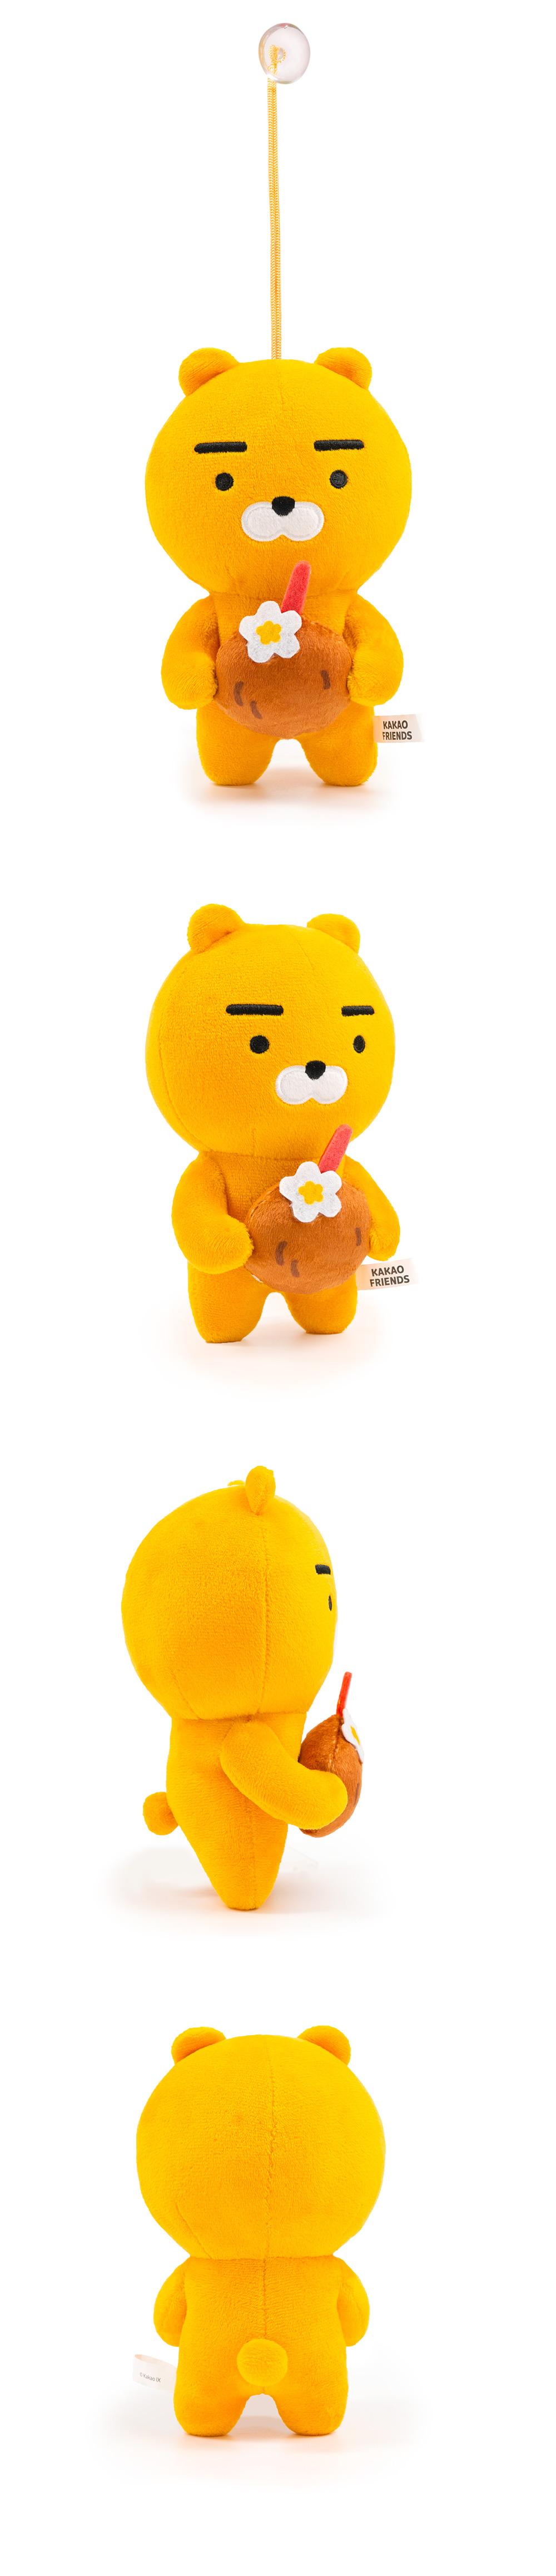 Kakao Friends夏日系列-Ryan拿椰子款16CM【KF1816200502】